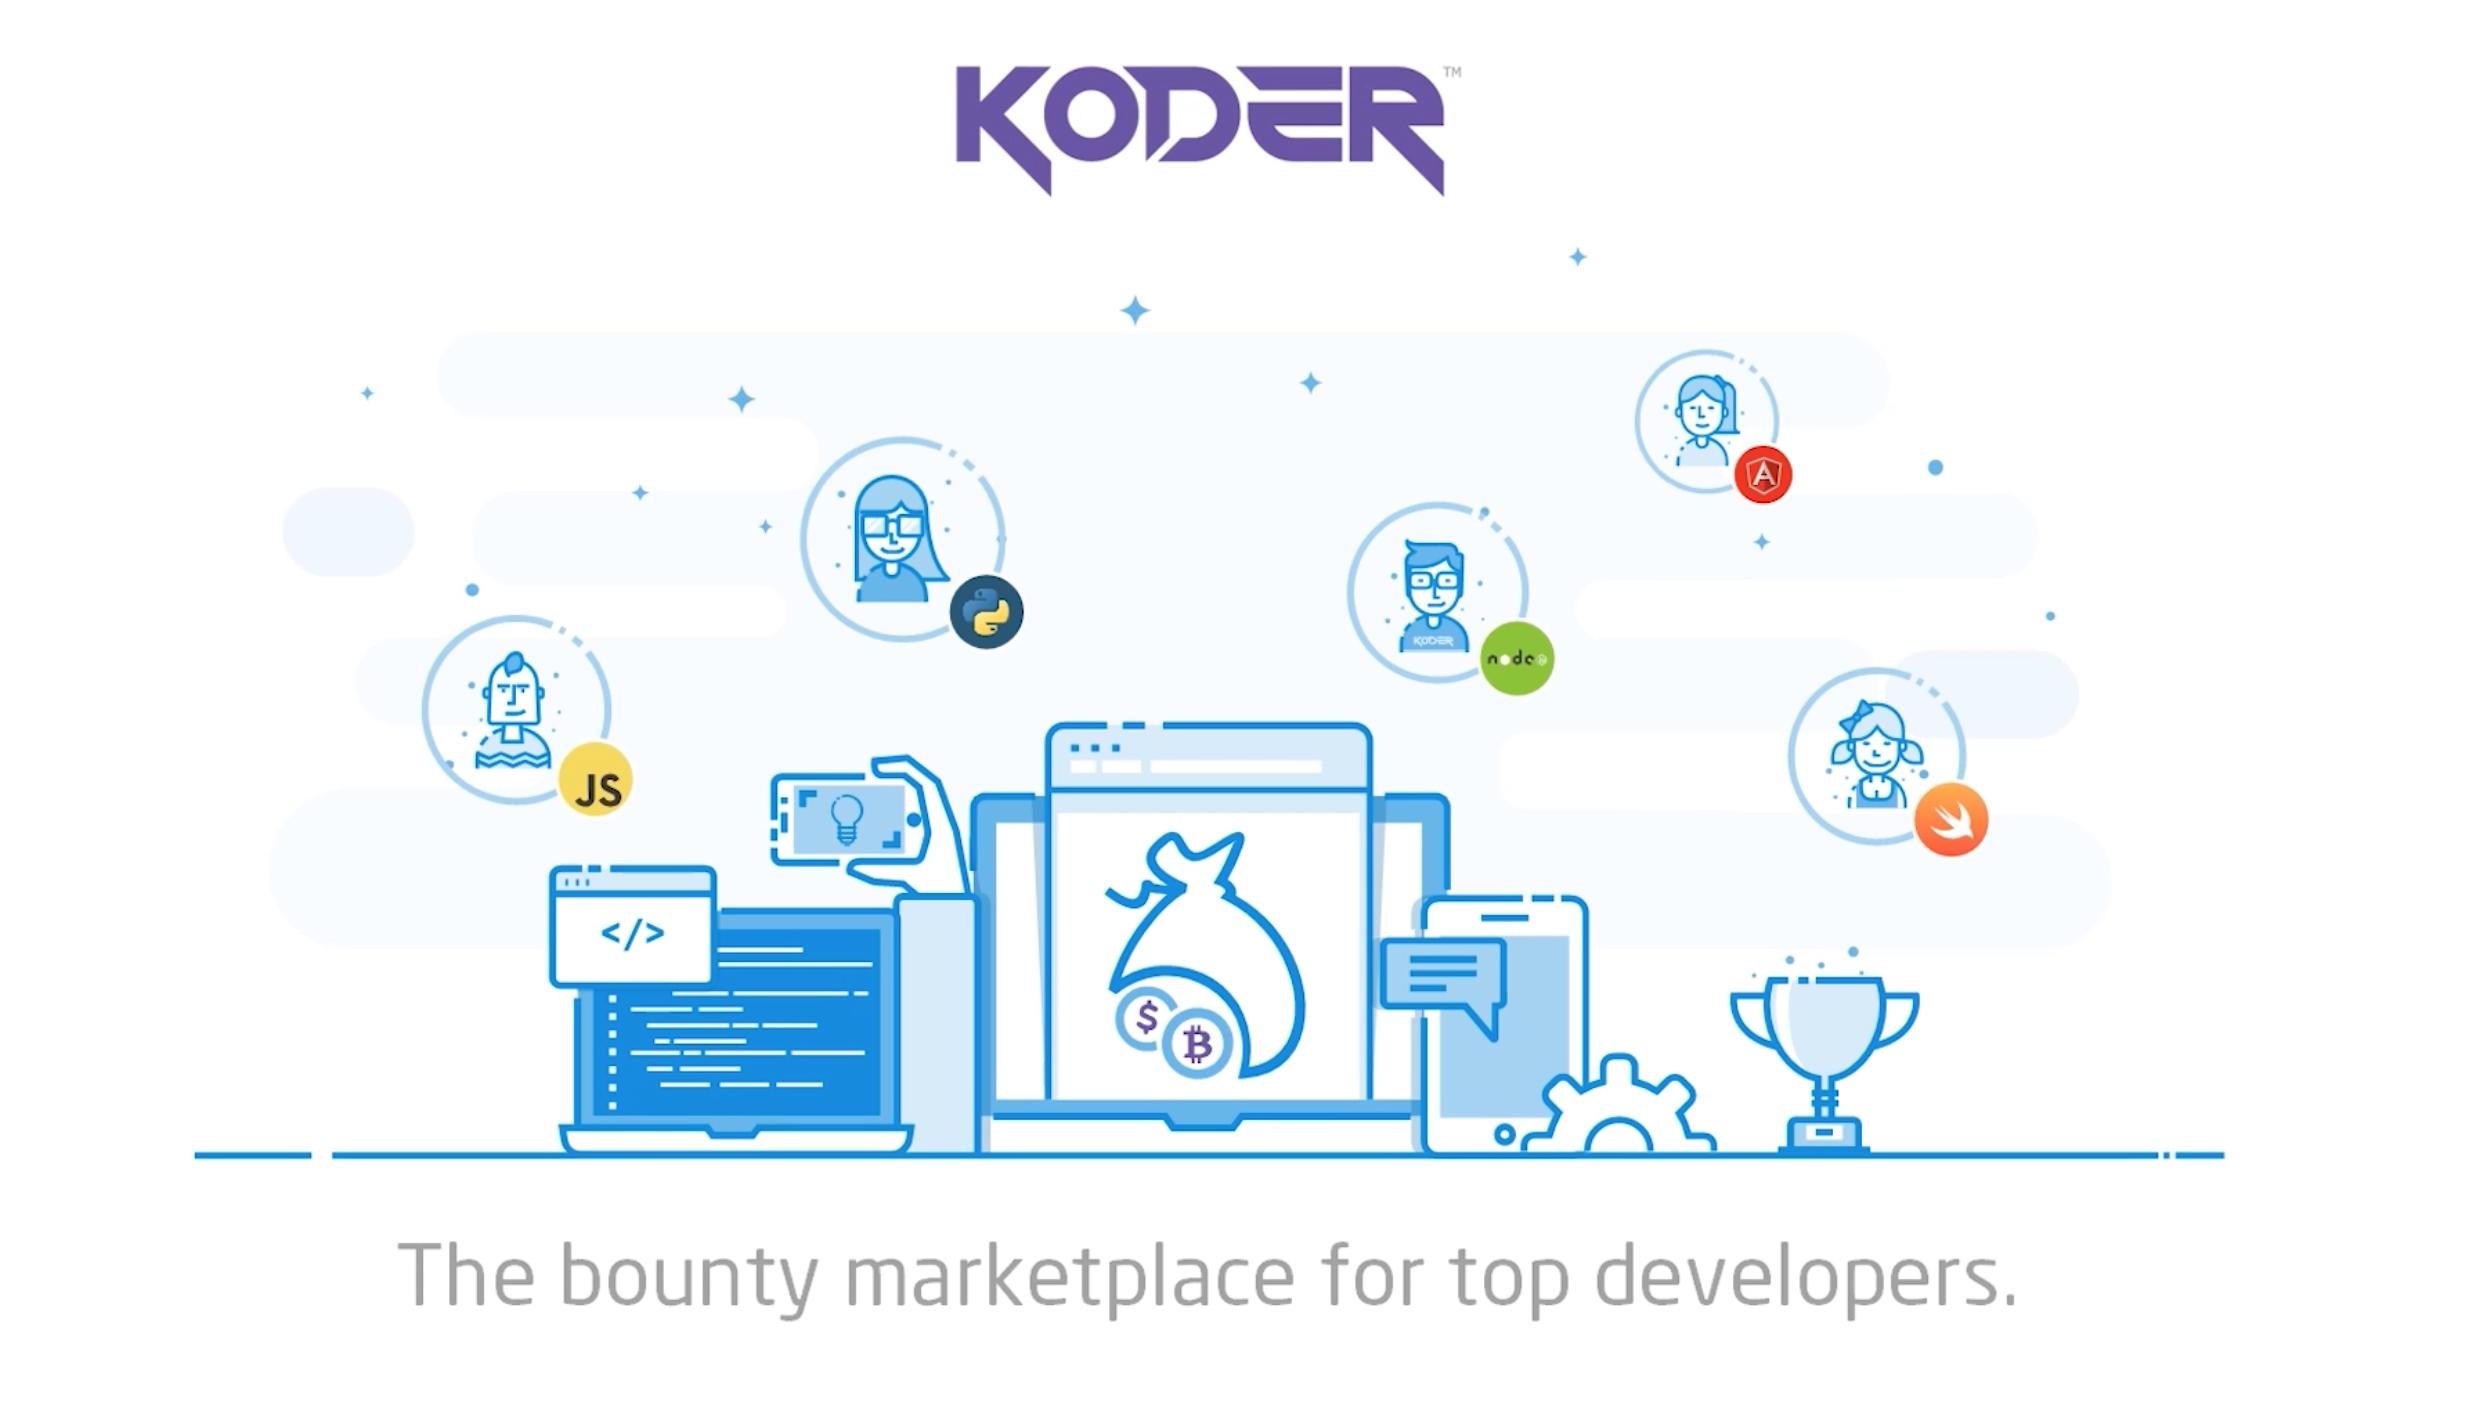 Koder Coding Marketplace